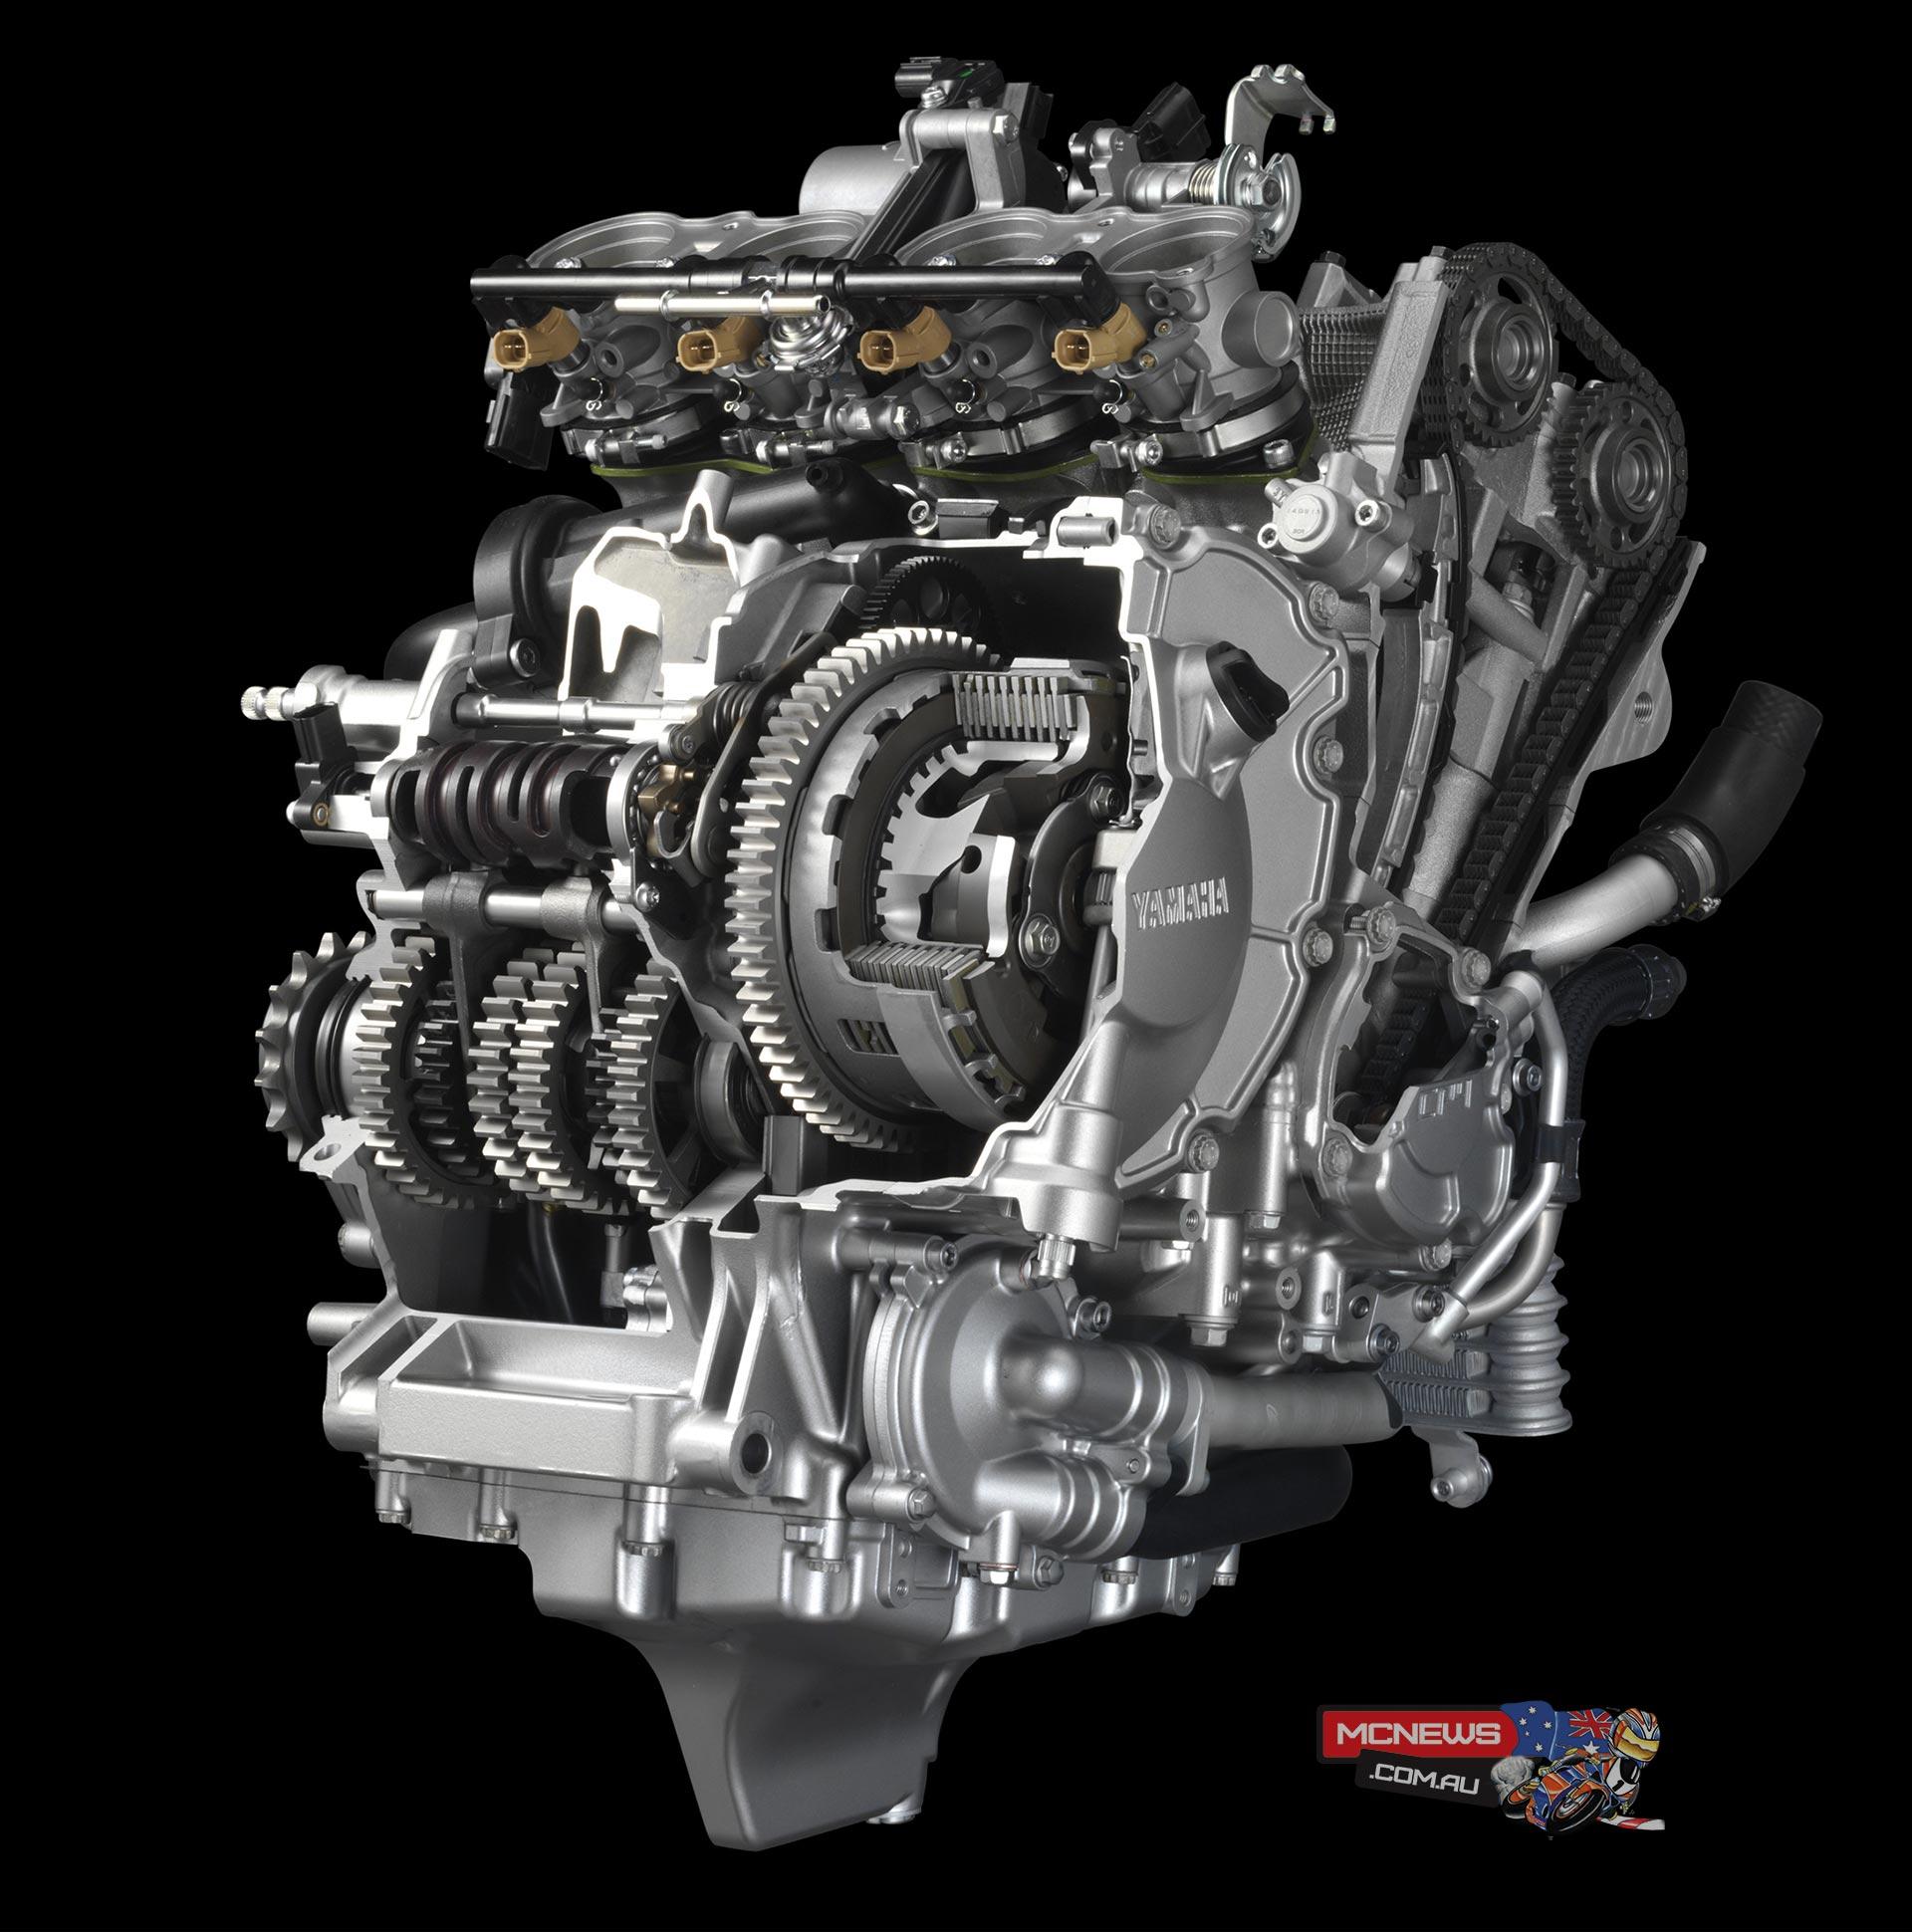 2015 Yamaha YZF-R1 Full Reveal | MCNews.com.au